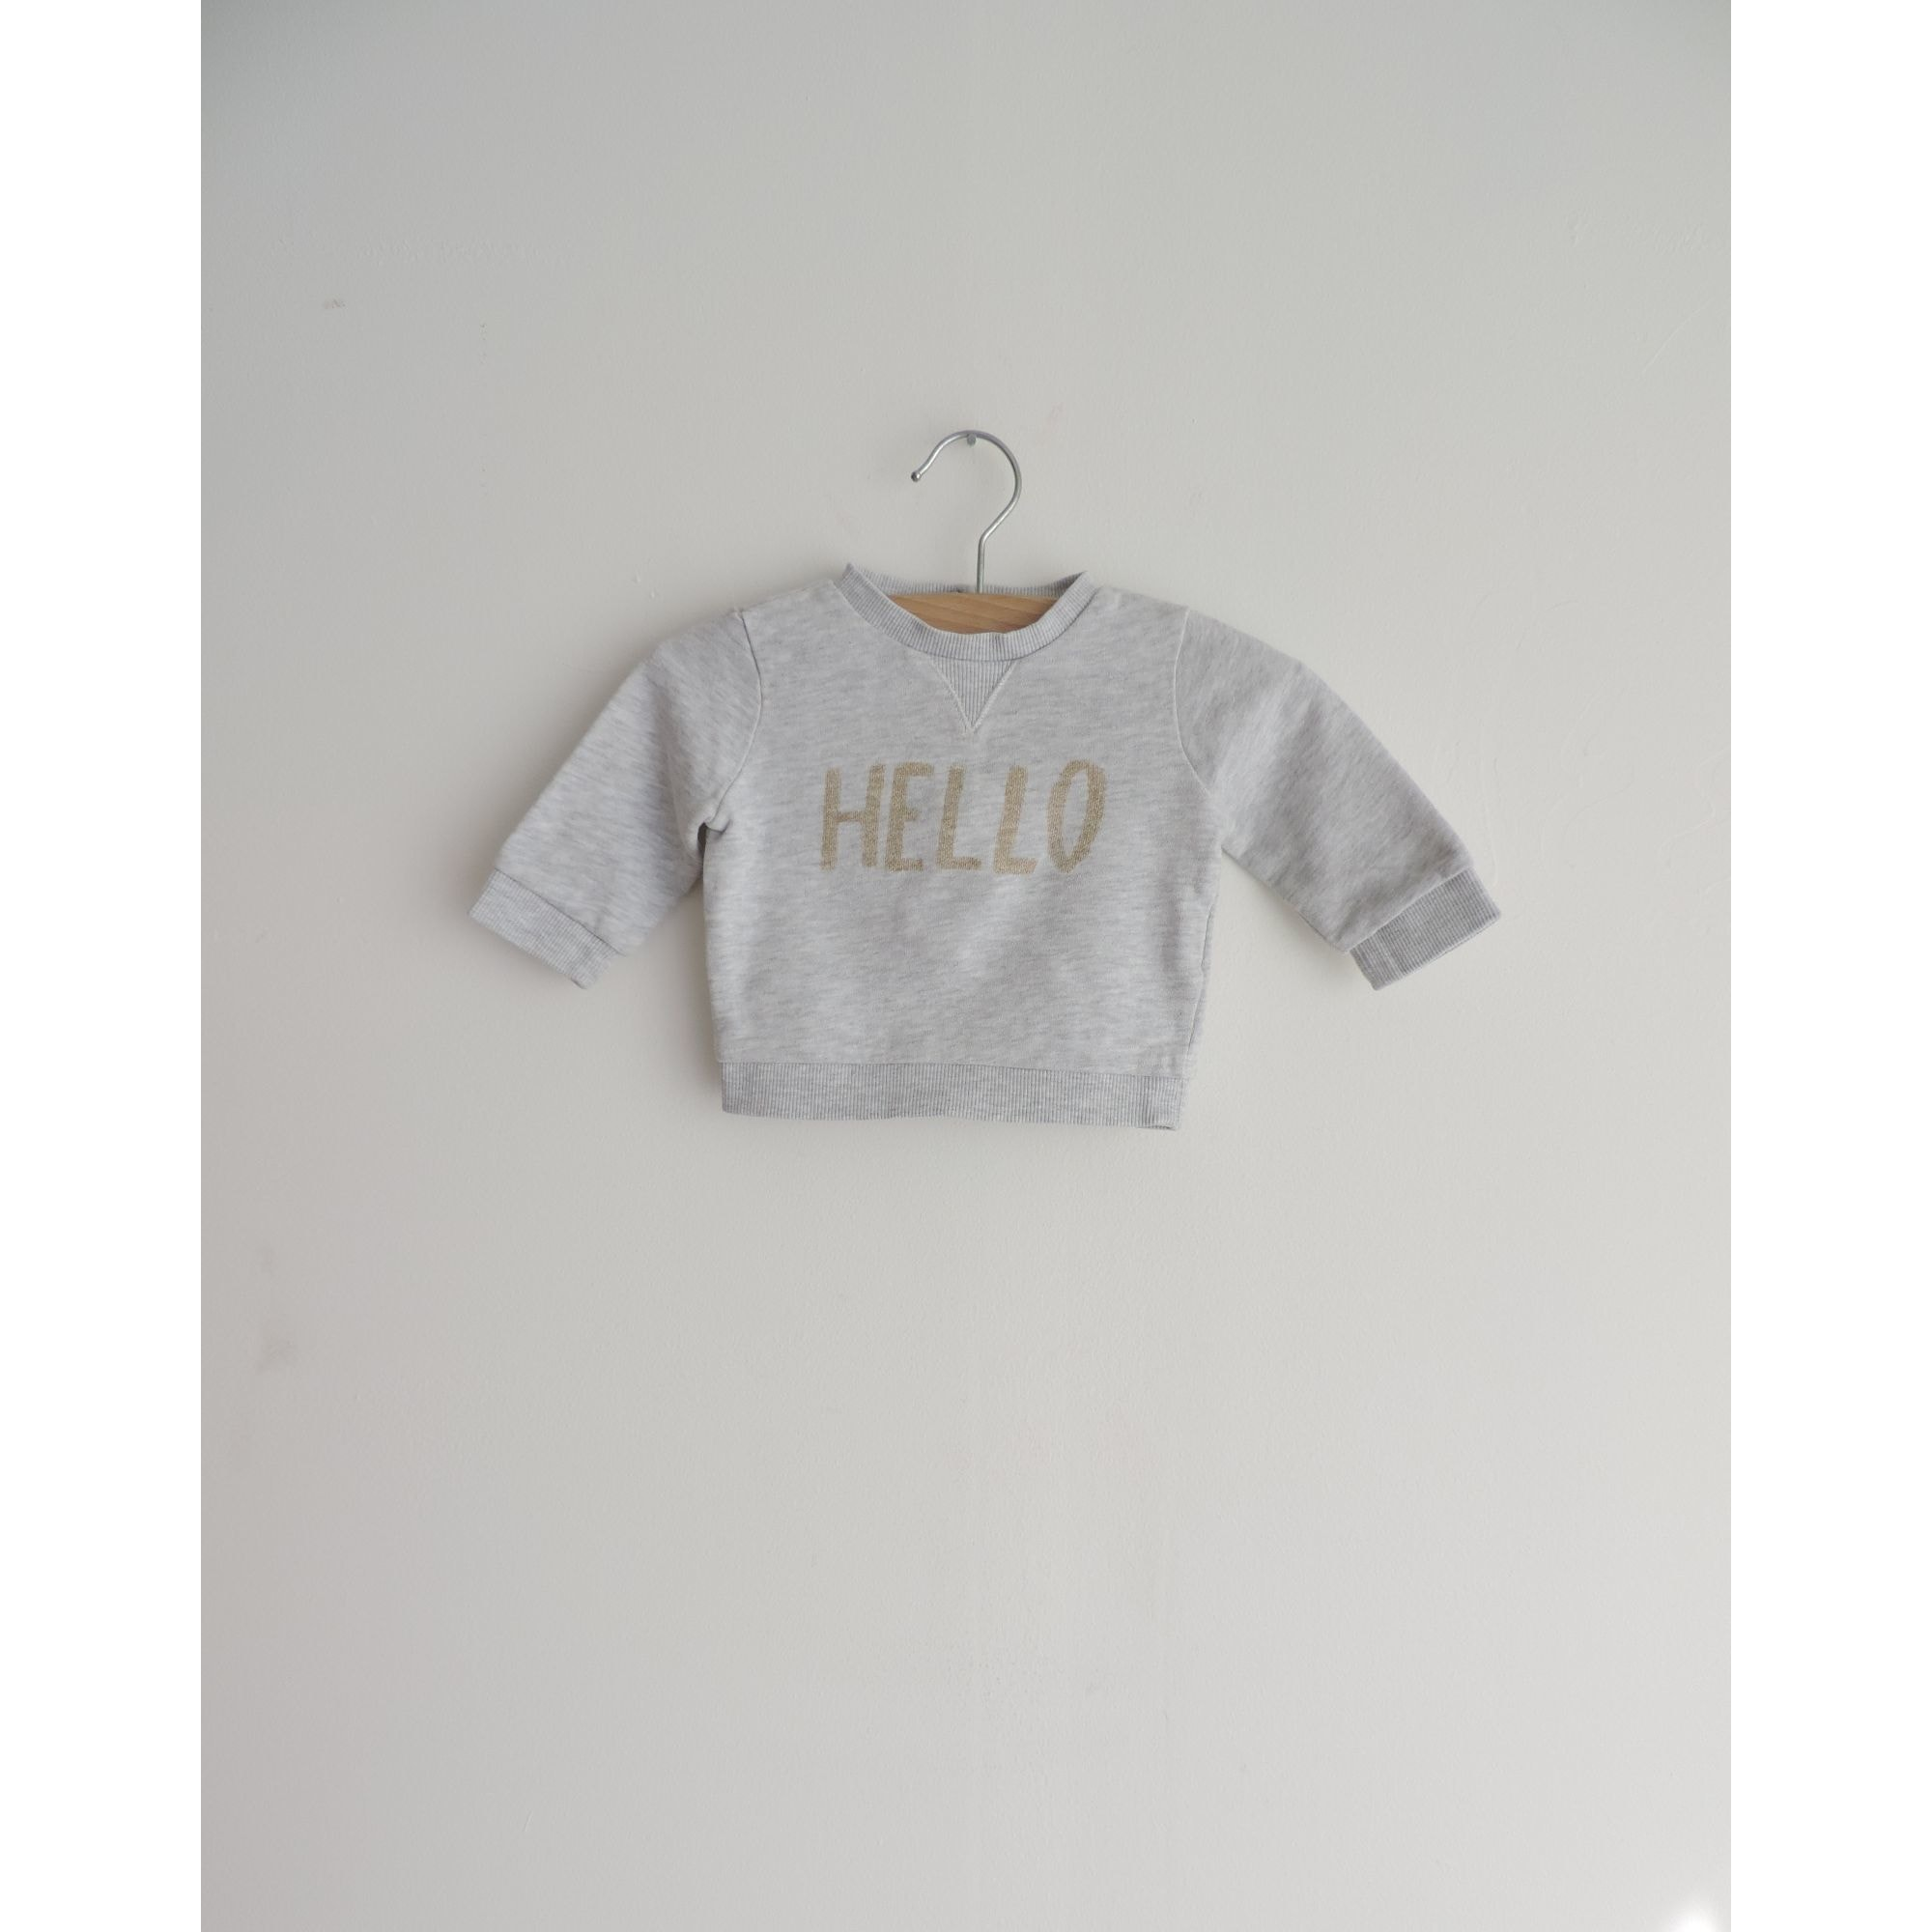 Sweatshirt KIABI Gray, charcoal